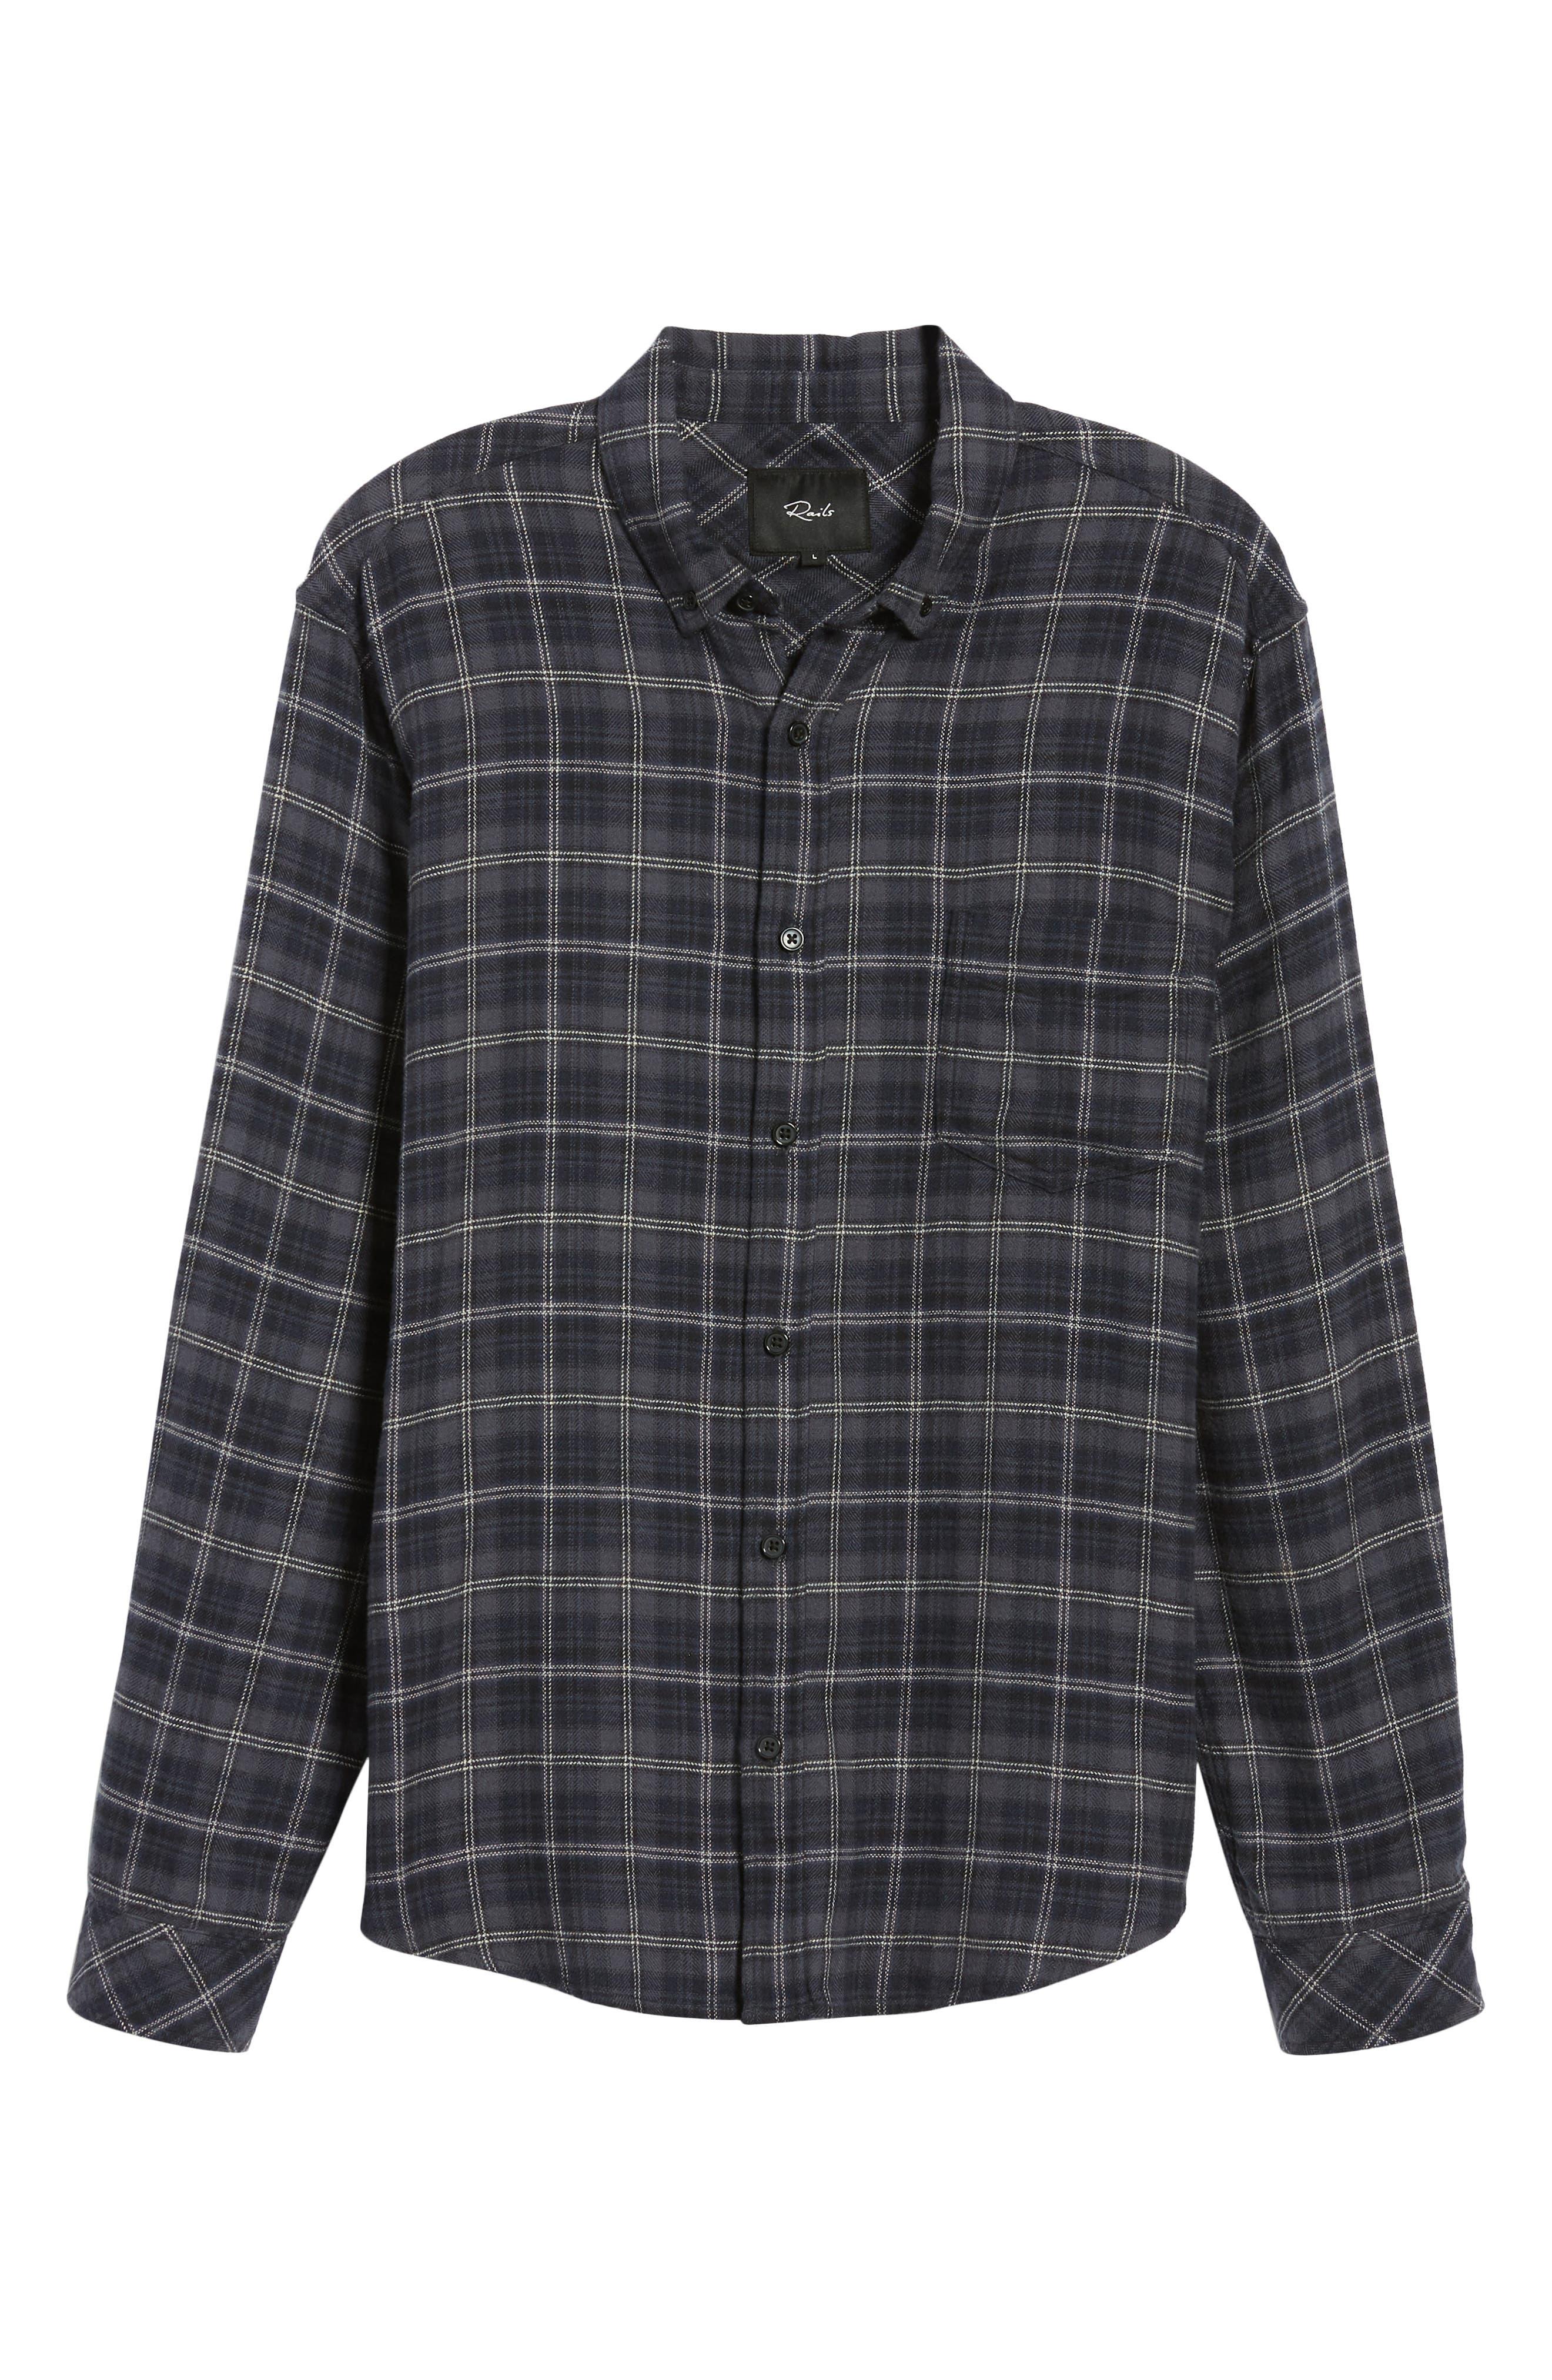 Lennox Slim Fit Plaid Sport Shirt,                             Alternate thumbnail 5, color,                             BLUE SMOKE/NAVY/BLACK